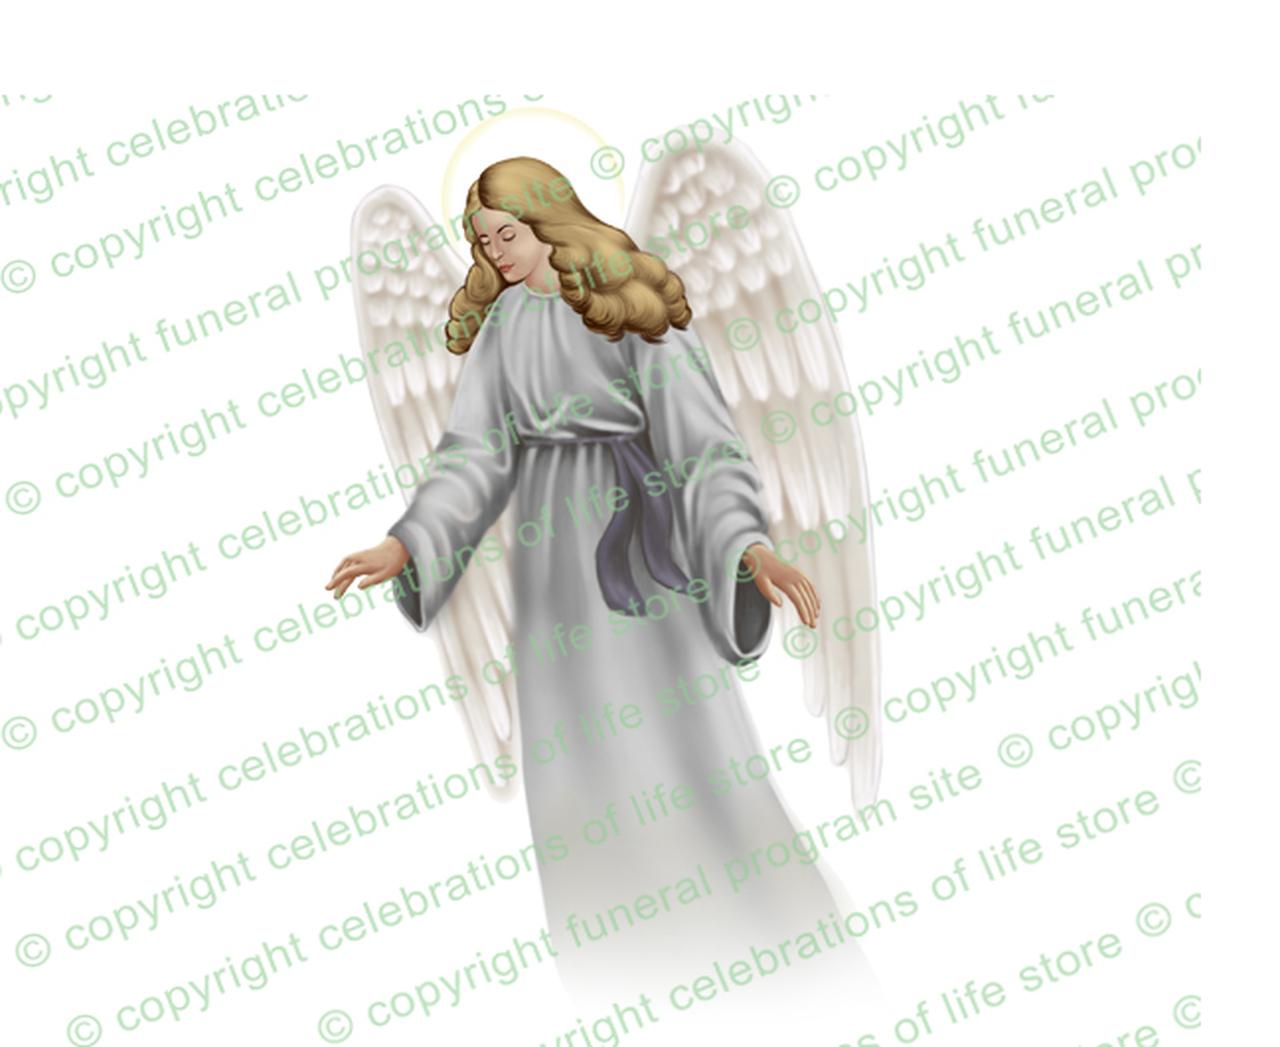 Funeral clipart vector. Eve angel clip art